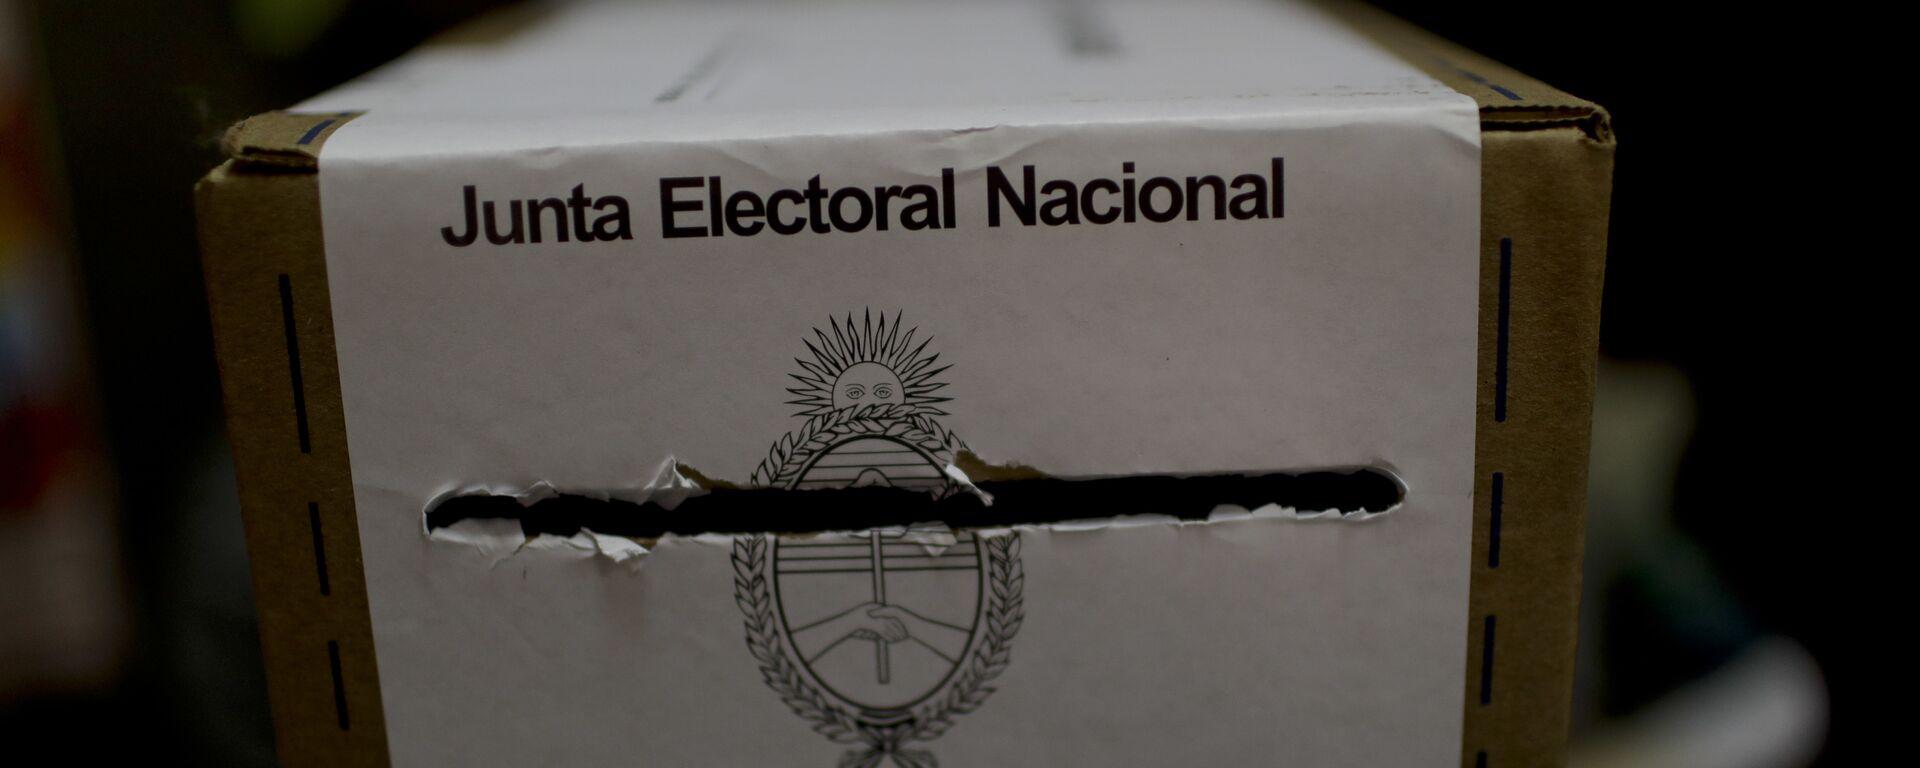 Elecciones legislativas en Argentina - Sputnik Mundo, 1920, 11.09.2021